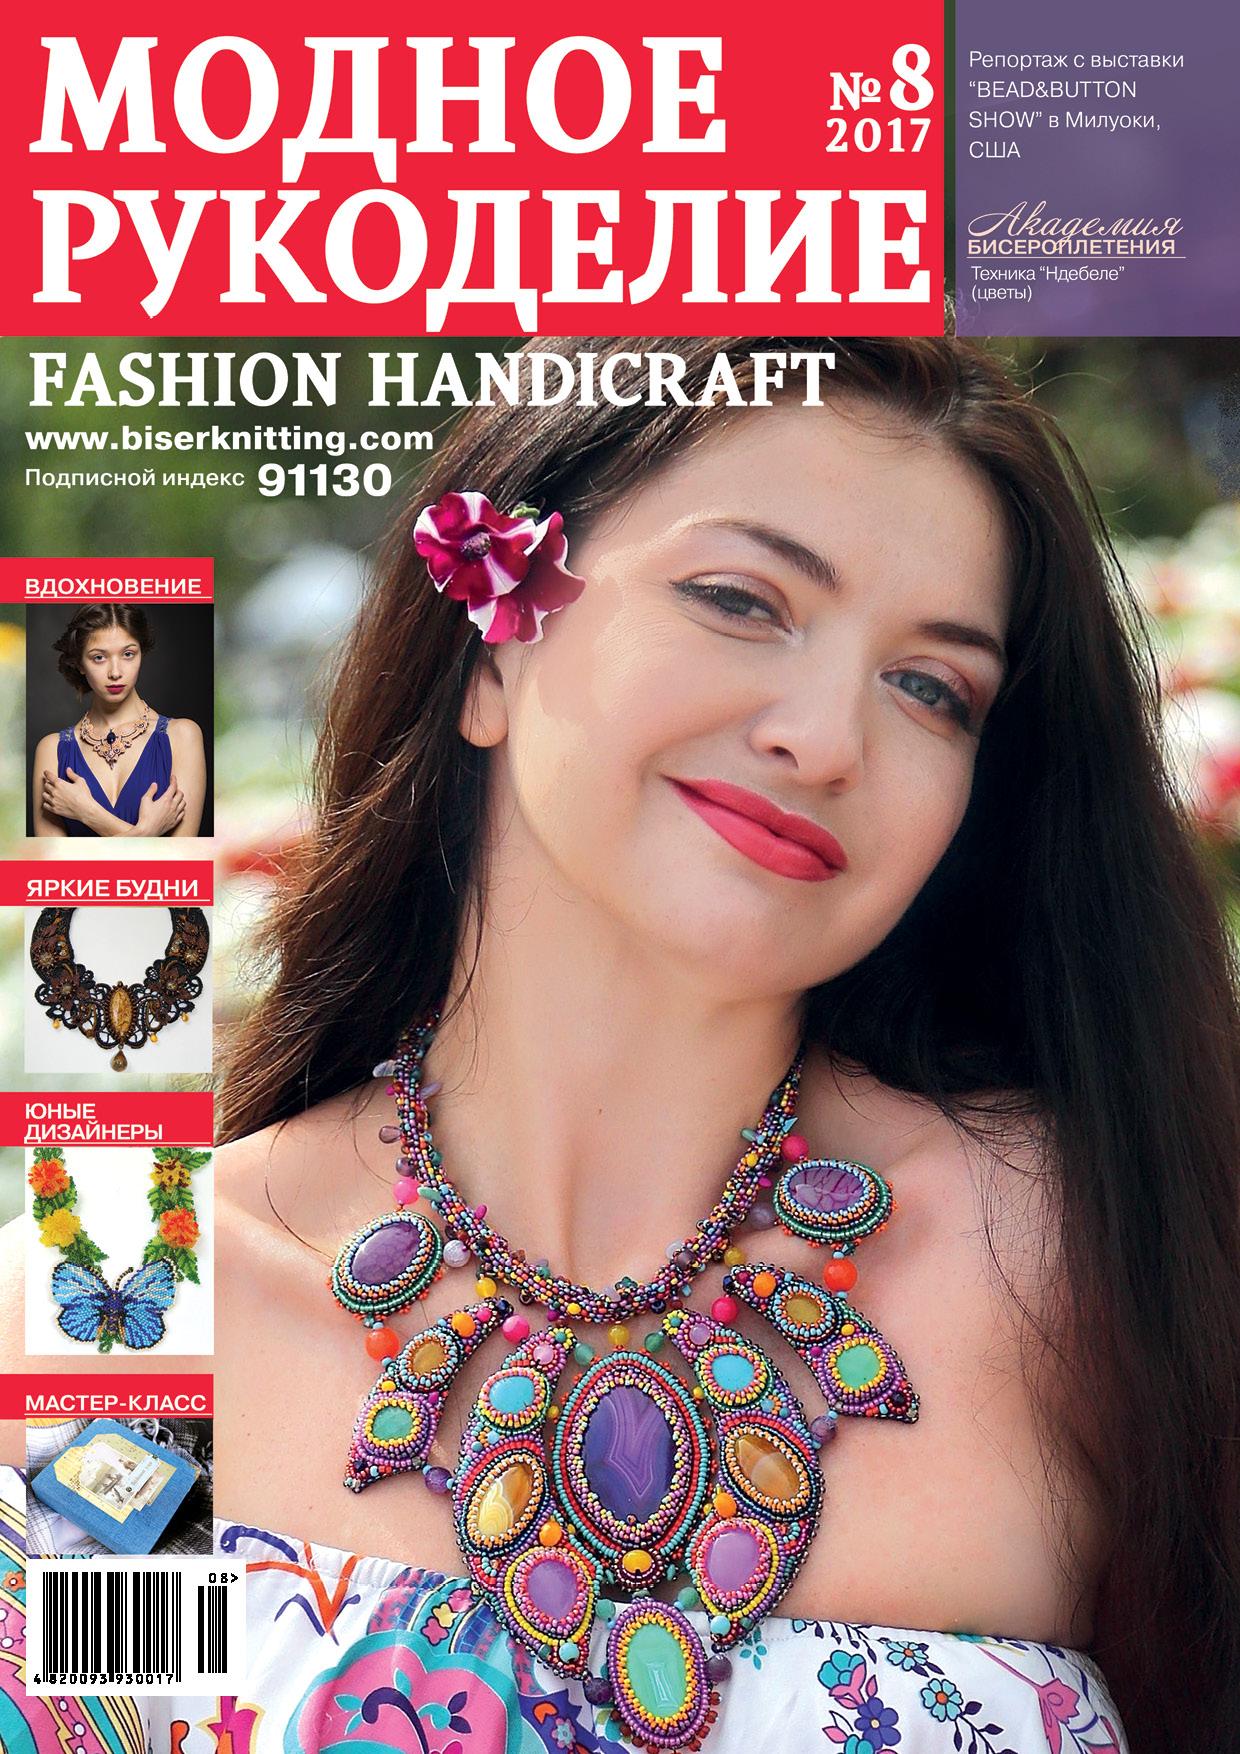 Fashion Handicraft #8 2017